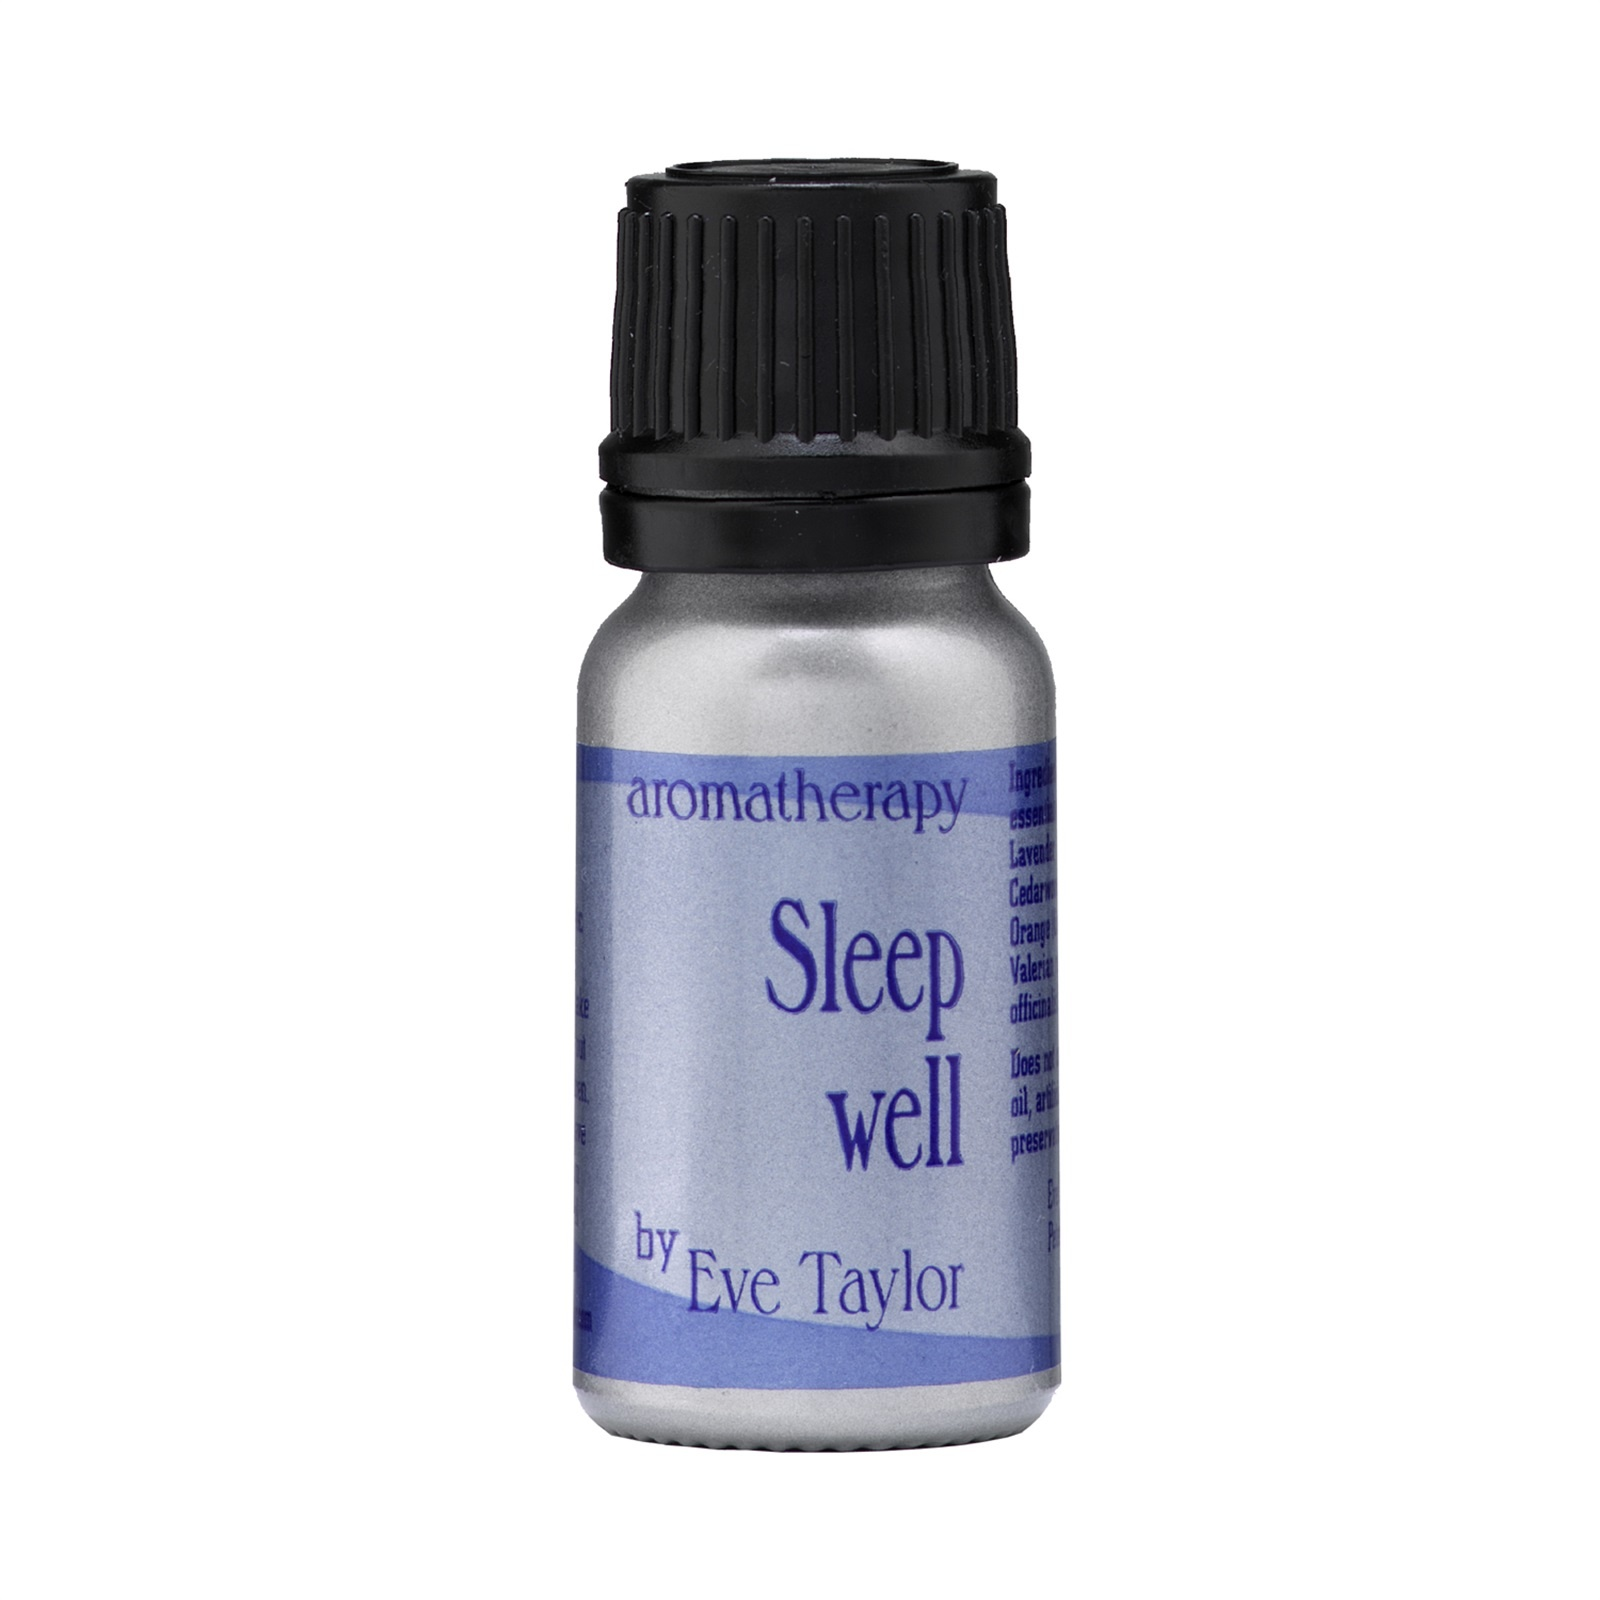 Eve Taylor Sleep Well Diffuser Blend